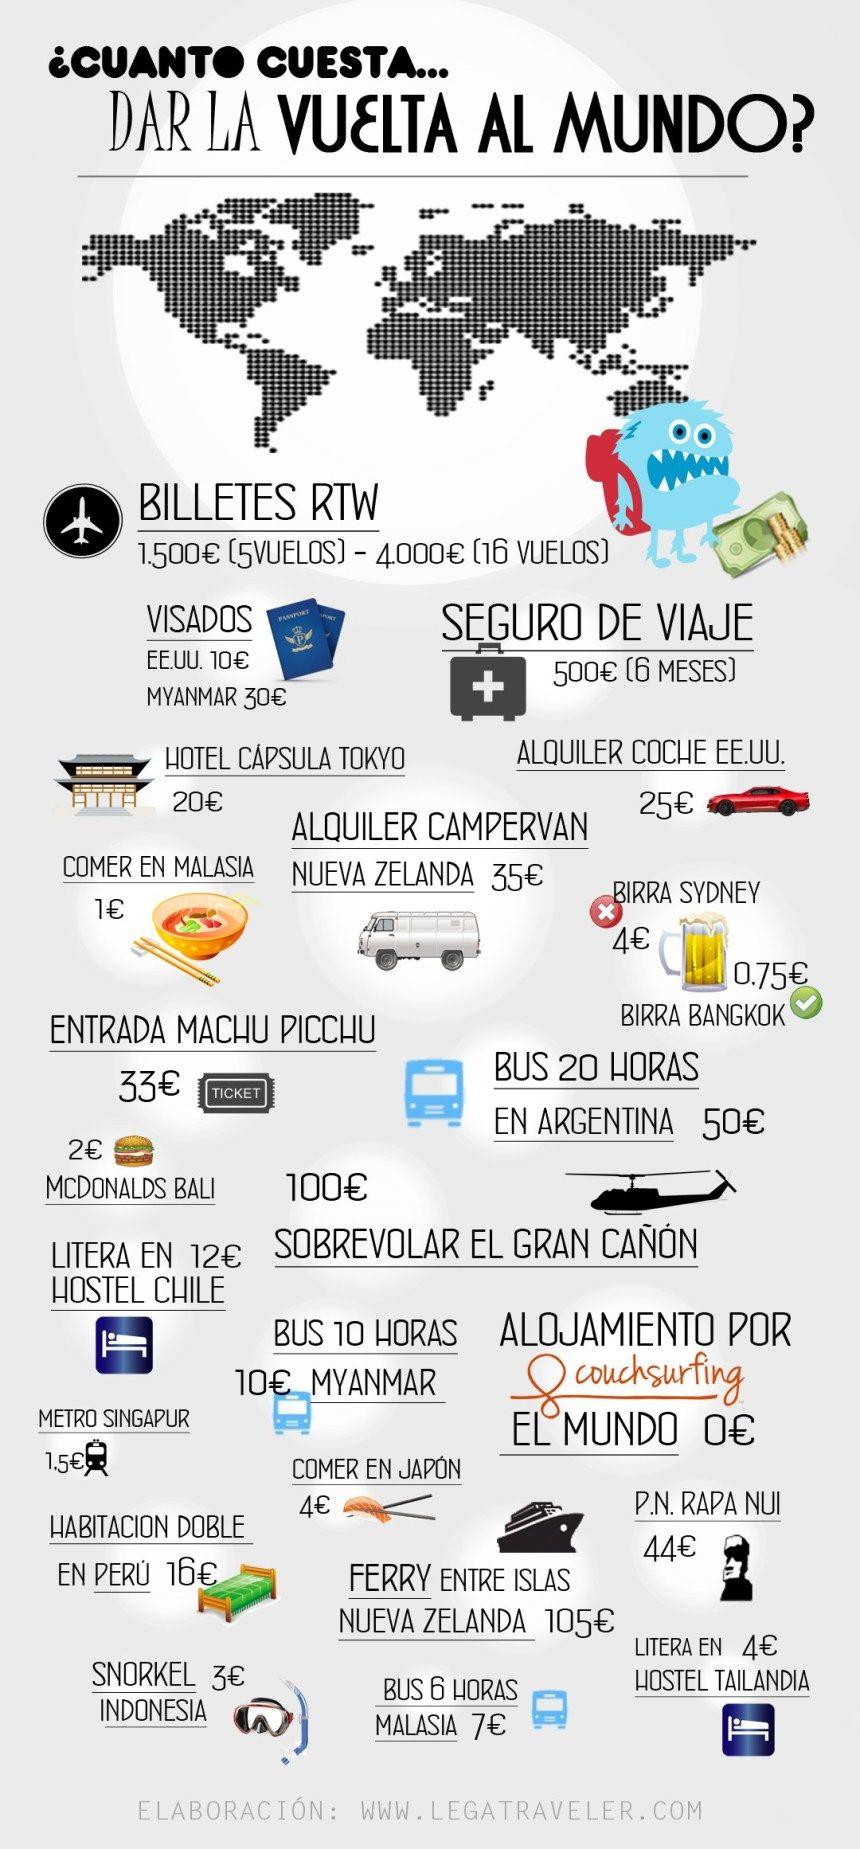 Cuanto Cuesta Dar La Vuelta Al Mundo Infografia Infographic